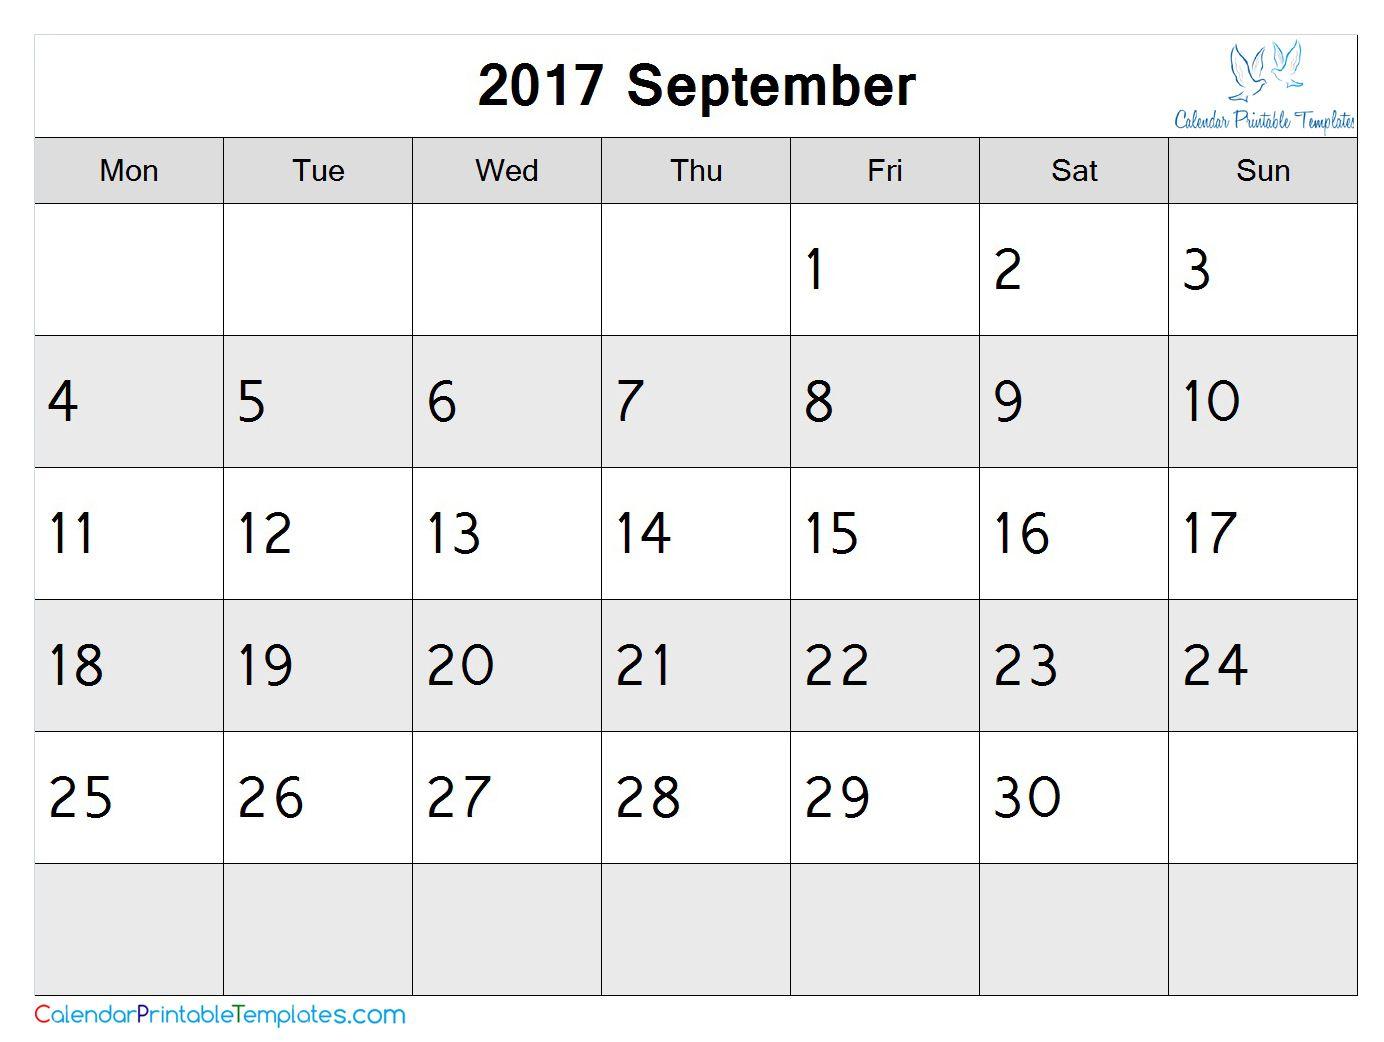 Pin By Calendar Printable On September 2017 Calendar May 2017